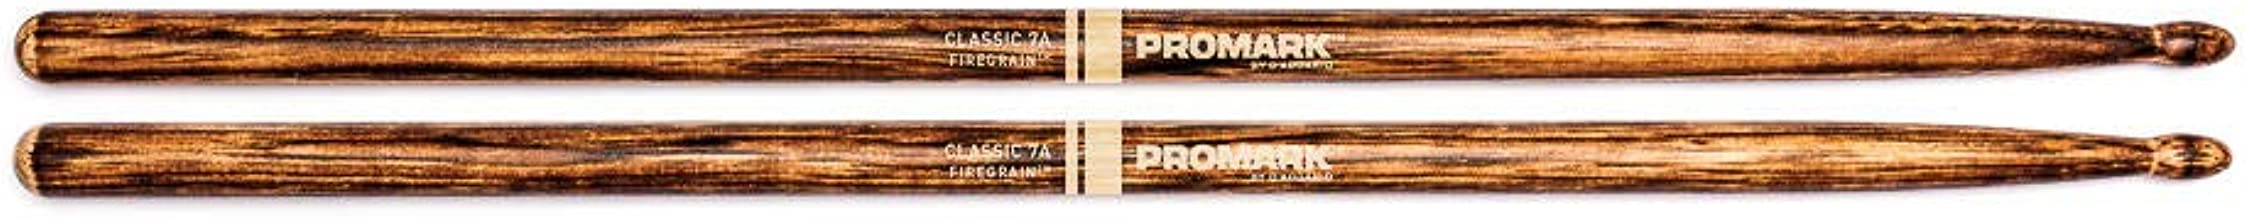 PROMARK プロマーク ドラムスティック FIREGRAIN Classic 7A TX7AW-FG (390 x 13.0mm) 【国内正規品】